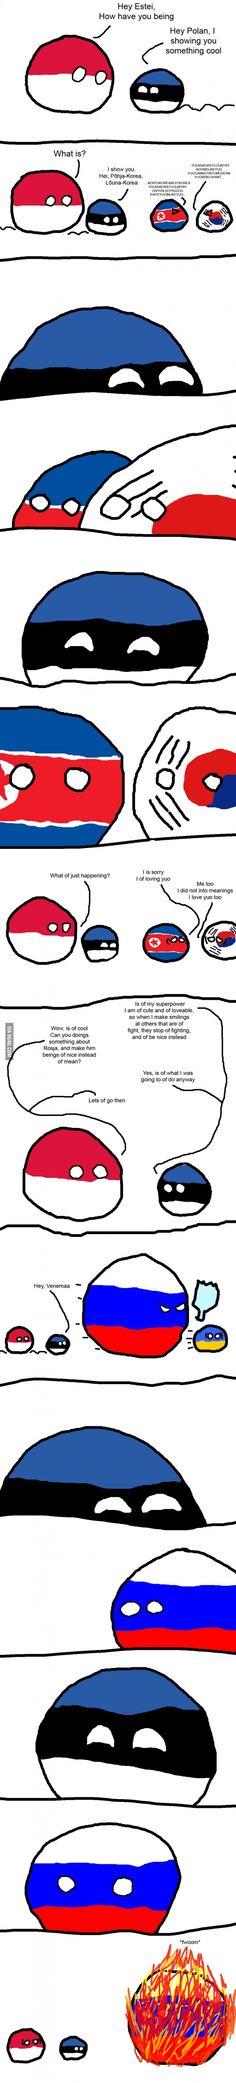 Oh you Estoniaball...